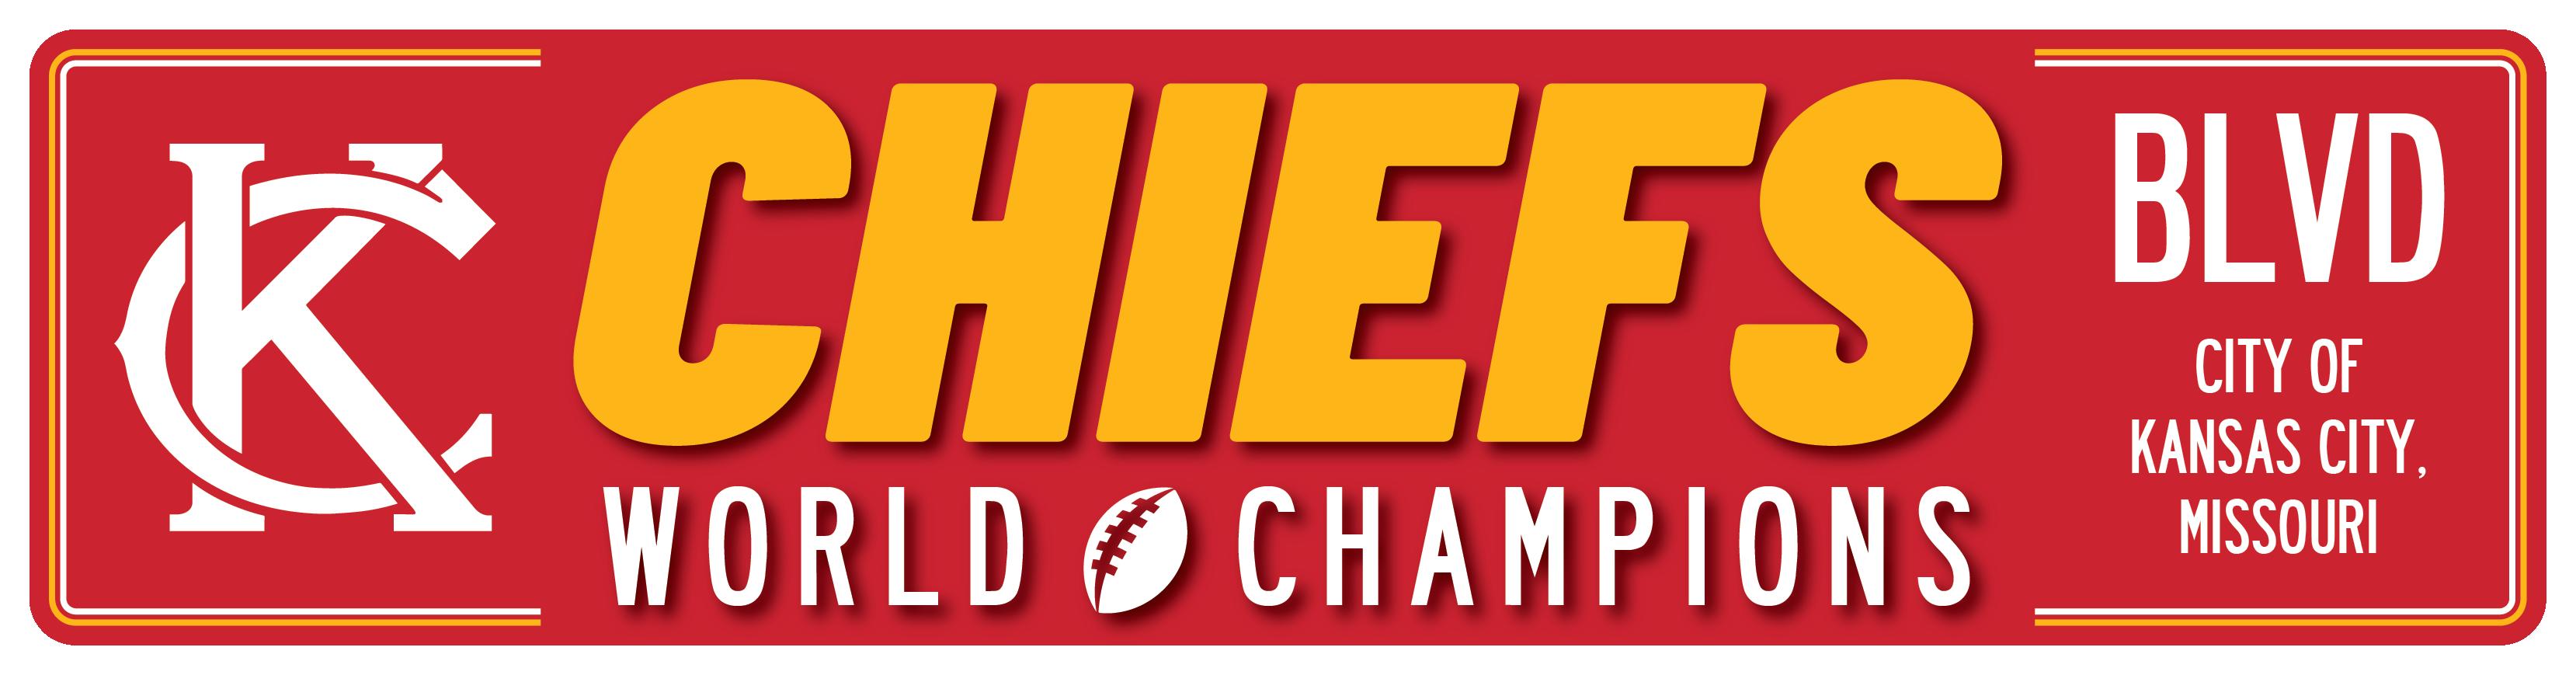 "6""x23"" KC Chiefs World Champions Blvd"